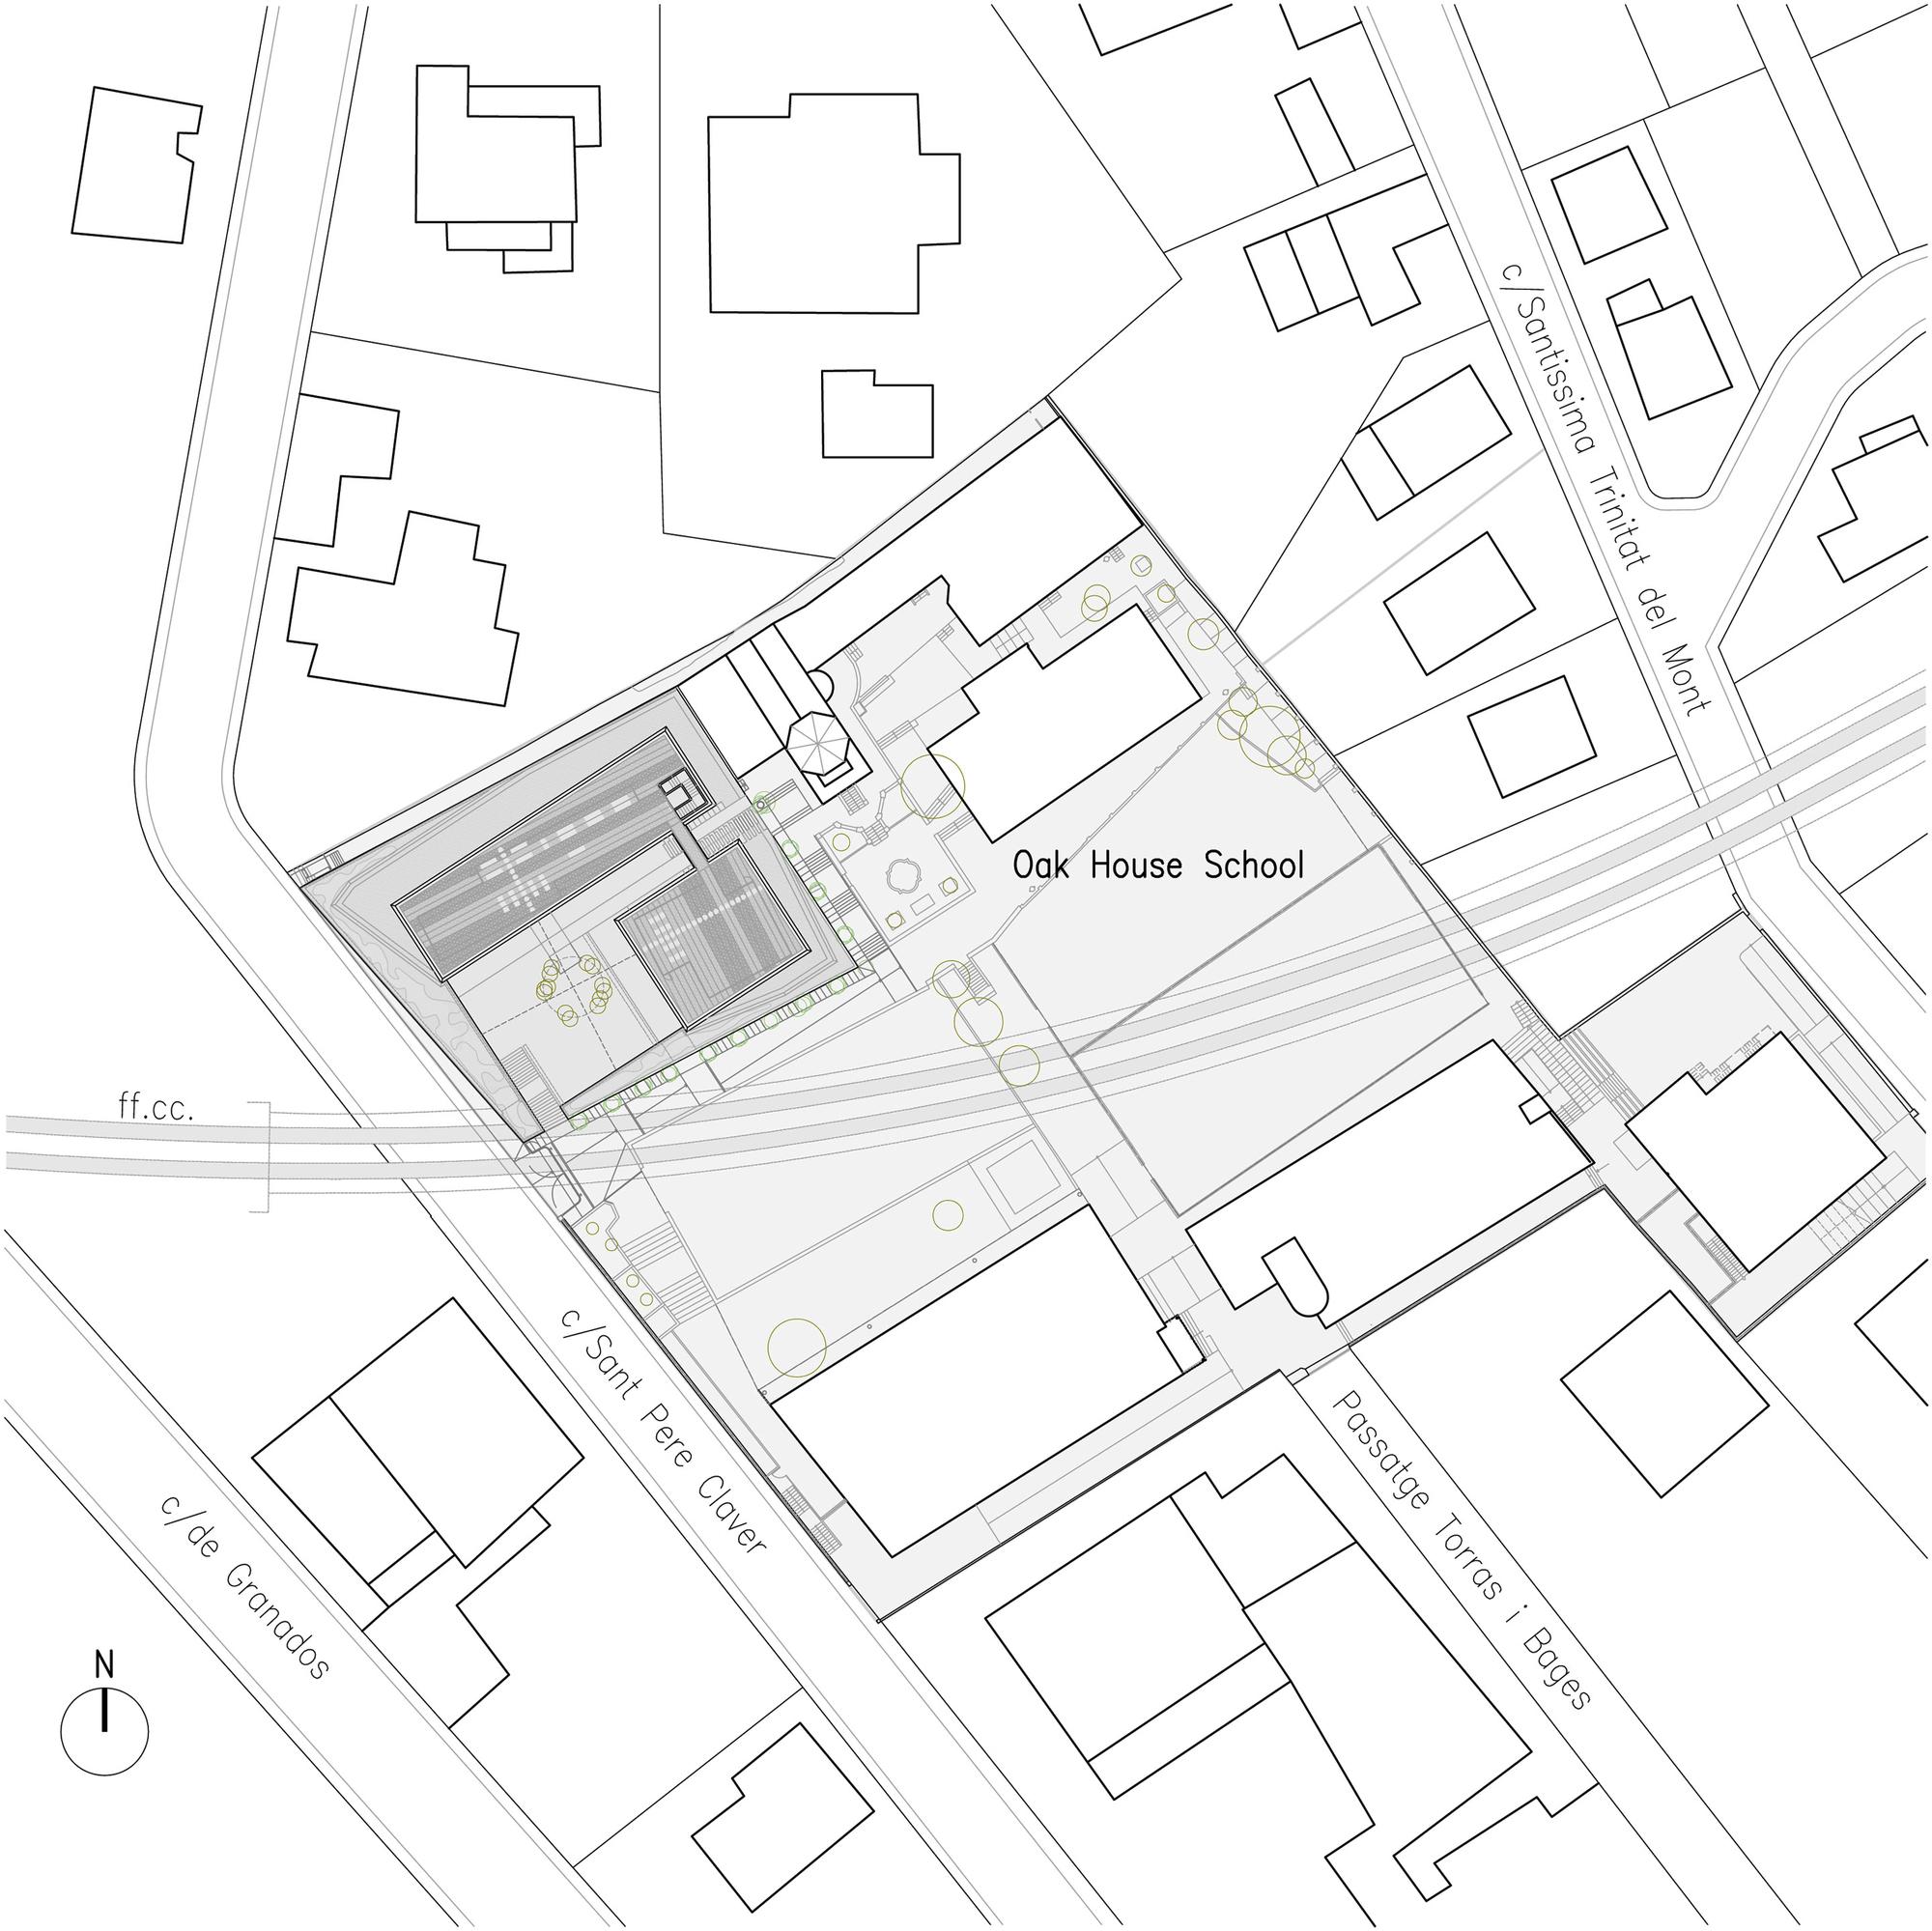 2000x1999 Gallery Of Oak House High School Building Trasbordo Arquitectura